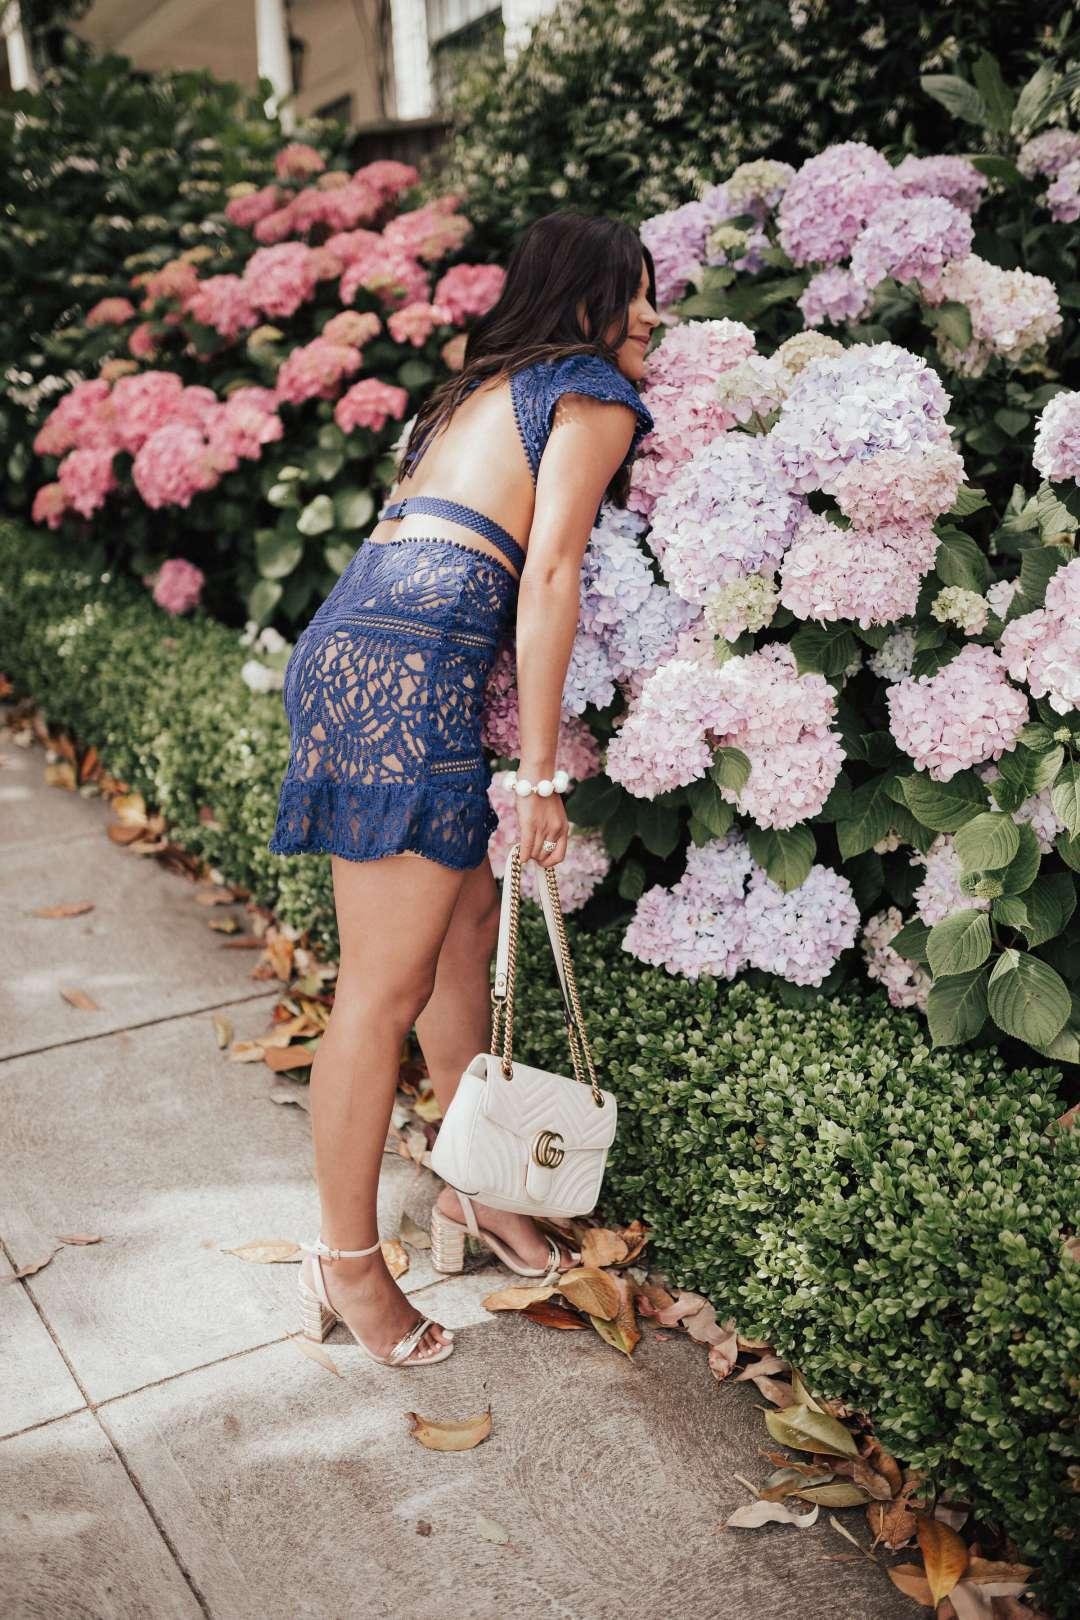 Lifestyle Blogger Kelsey Kaplan of Kelsey Kaplan Fashion wearing little navy dress and gucci purse